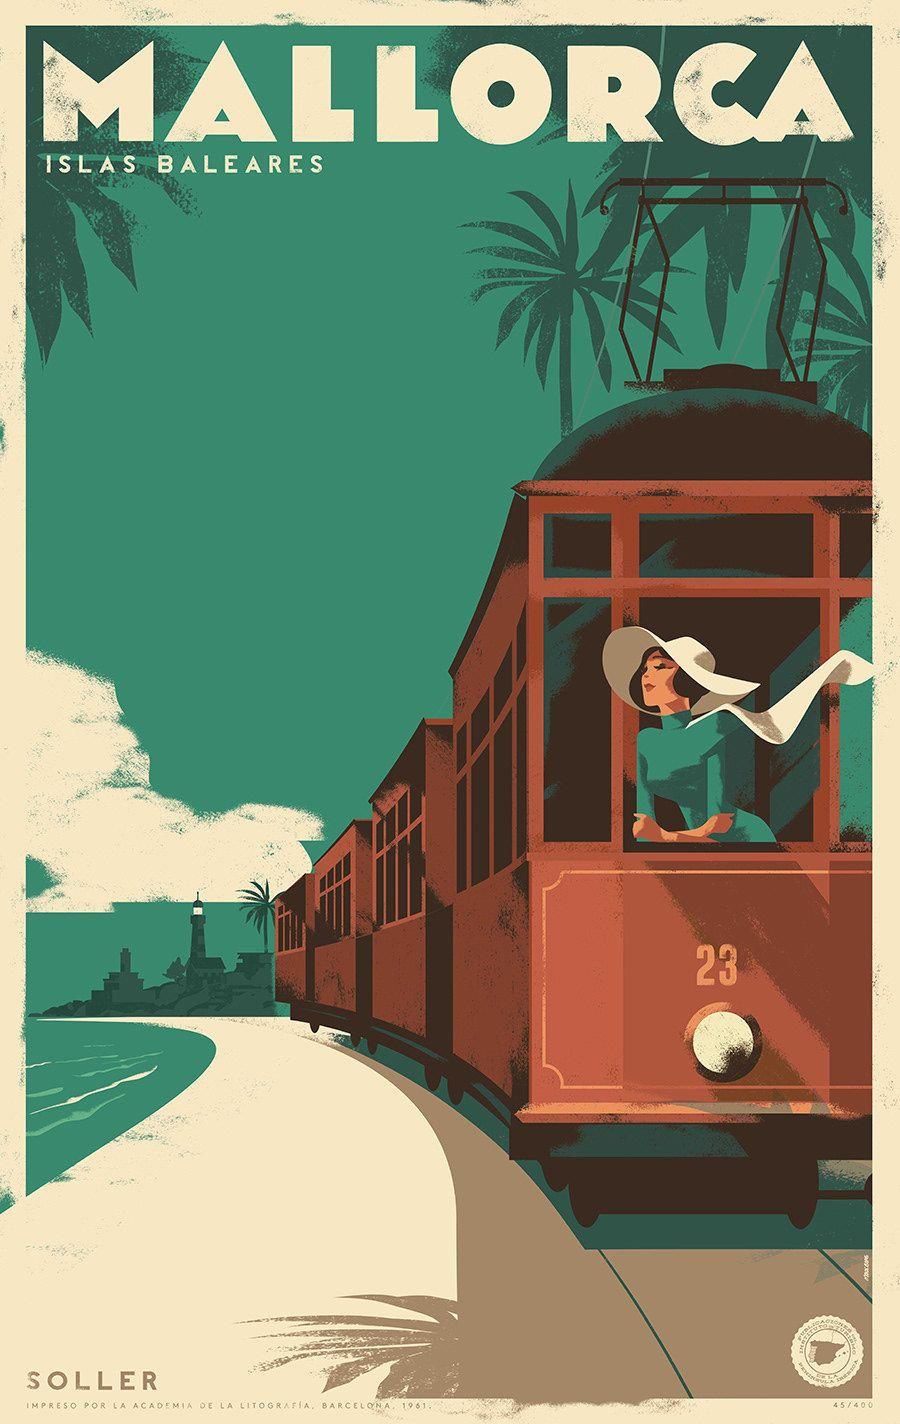 6e42f09cf02a0941fd6fe867fde34dbc - Ferrocarril de Sóller